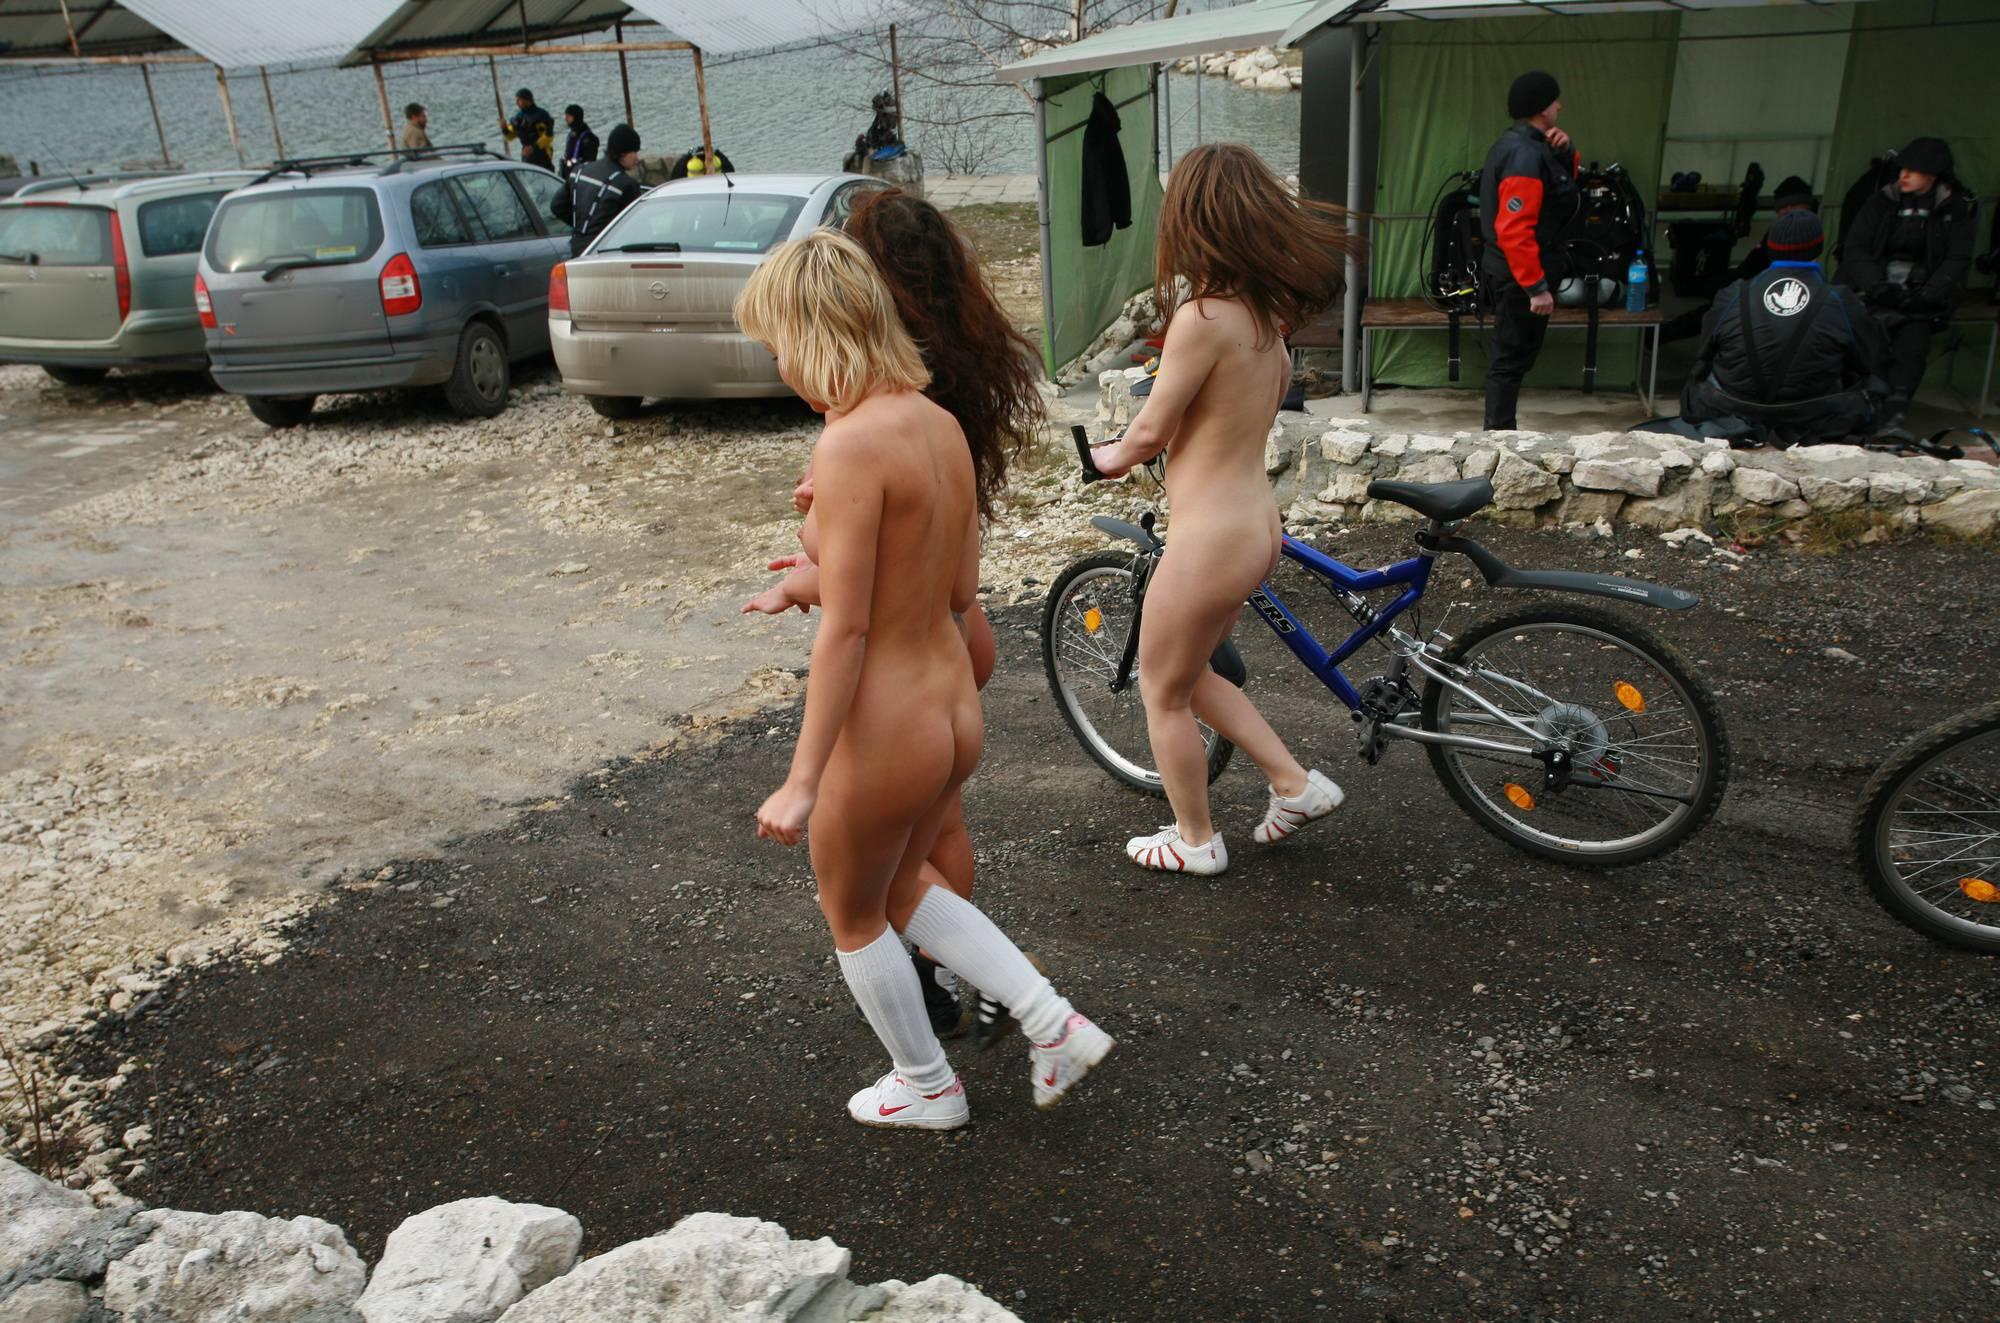 Nudist Gallery Camper Trip Bike Ride - 2